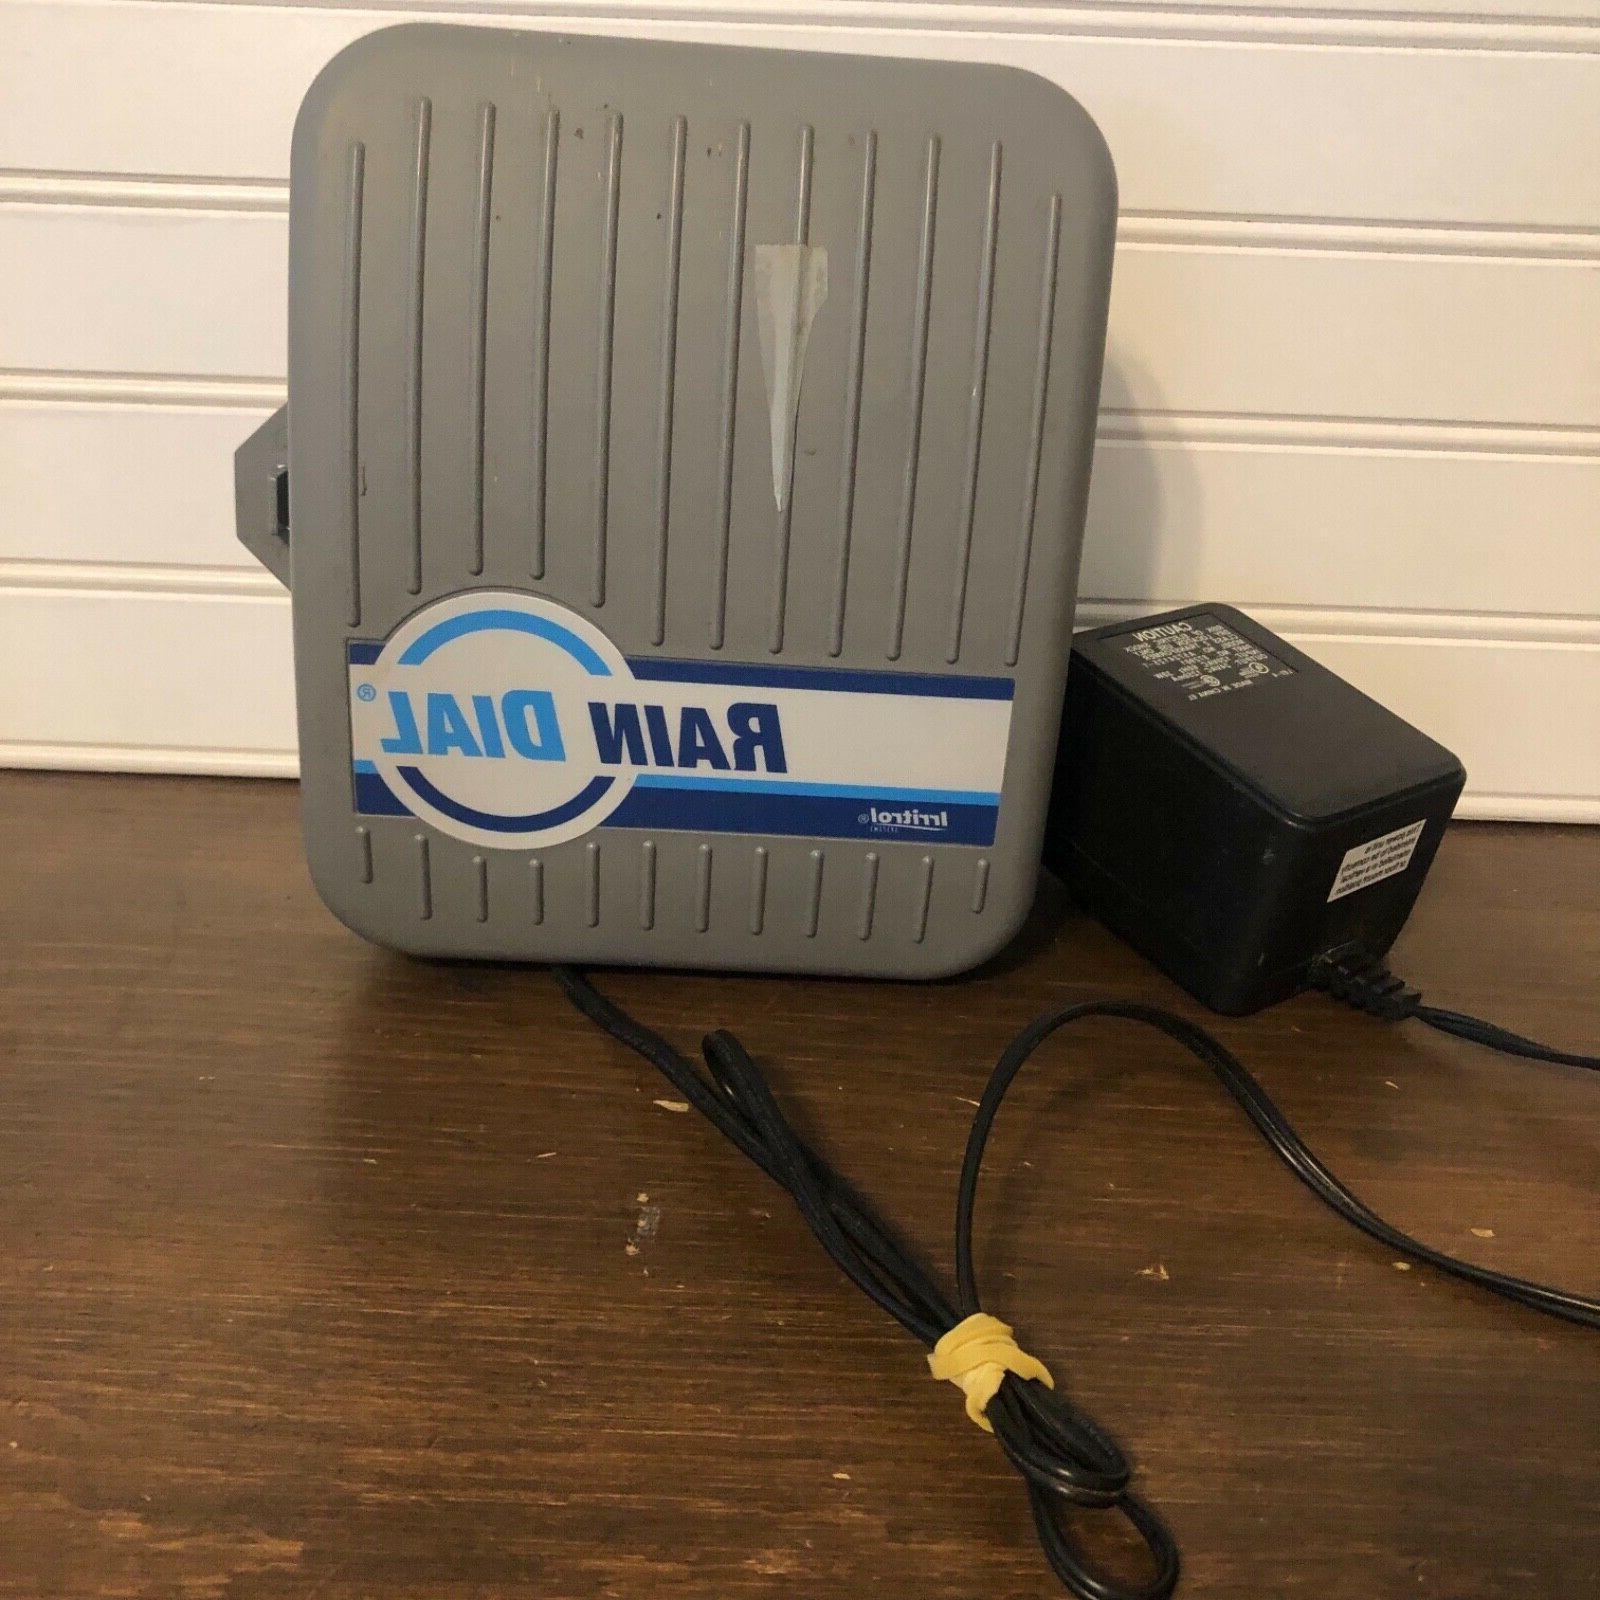 rd600 rain dial sprinkler controller preowned condition